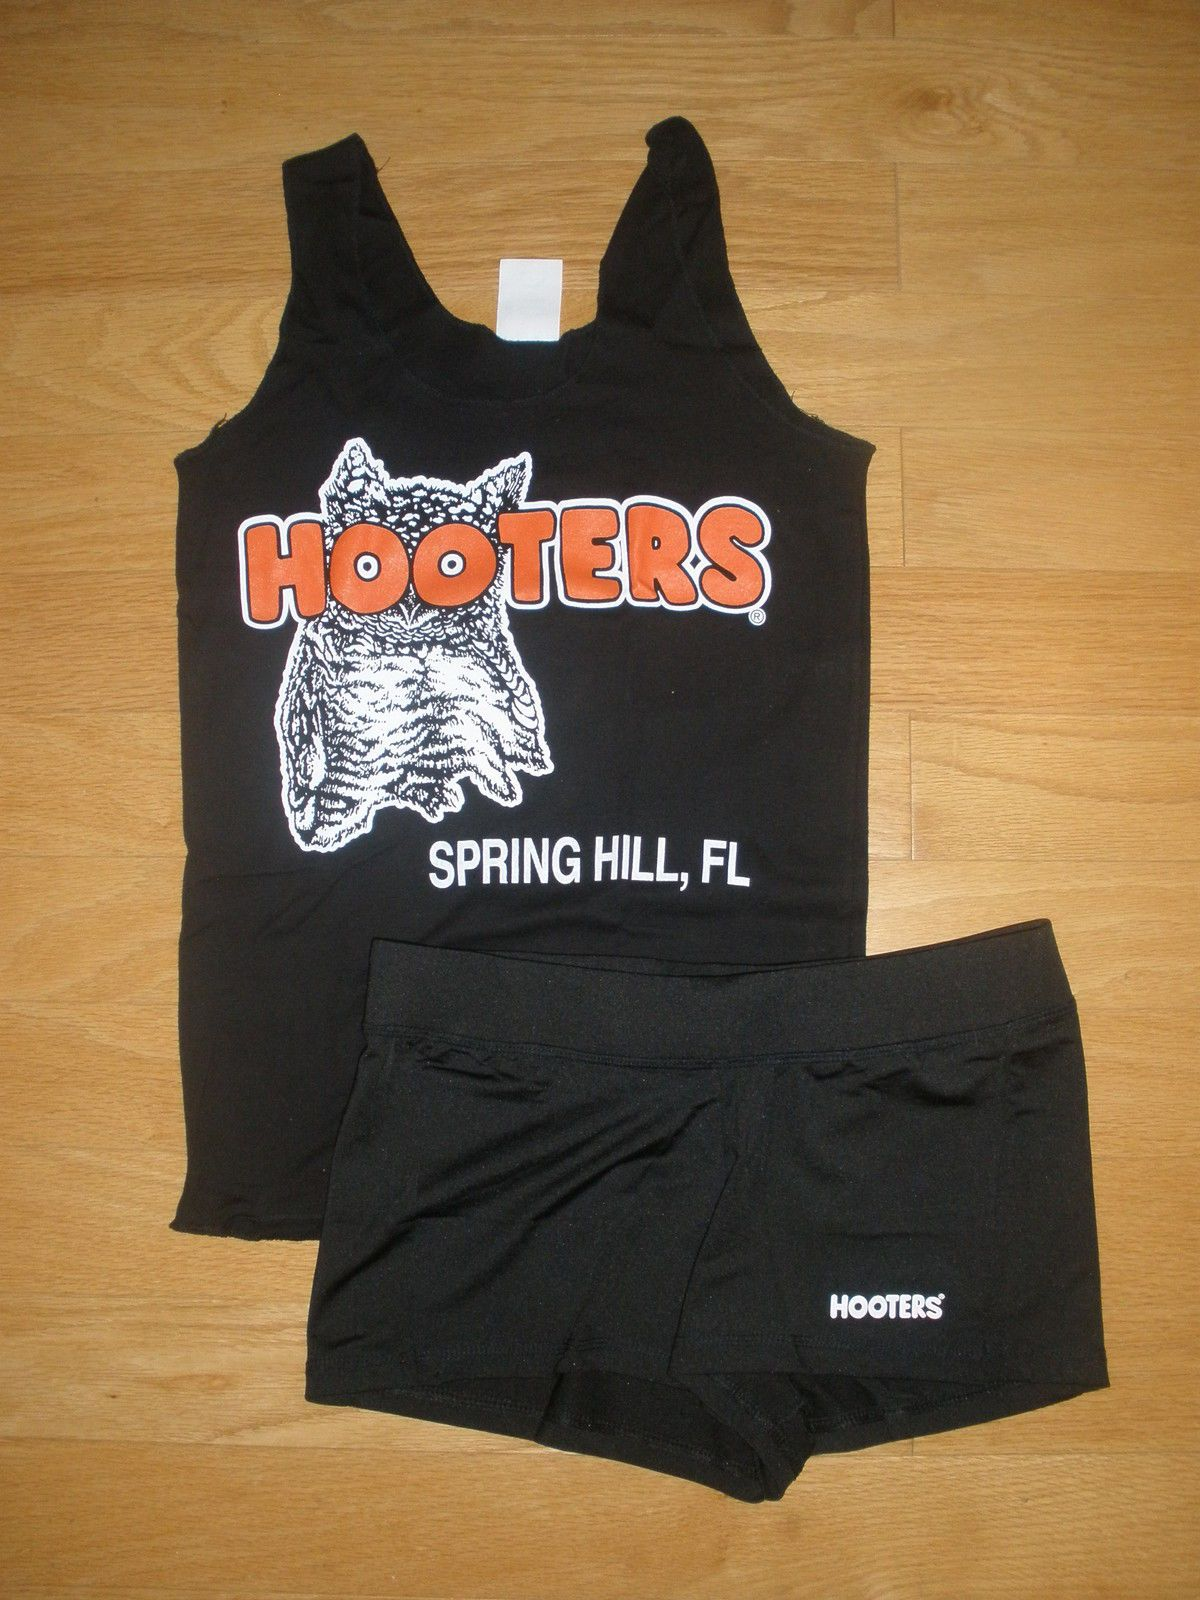 HOOTERS UNIFORM XXS shirt, shorts XS S HALLOWEEN COSTUME SET